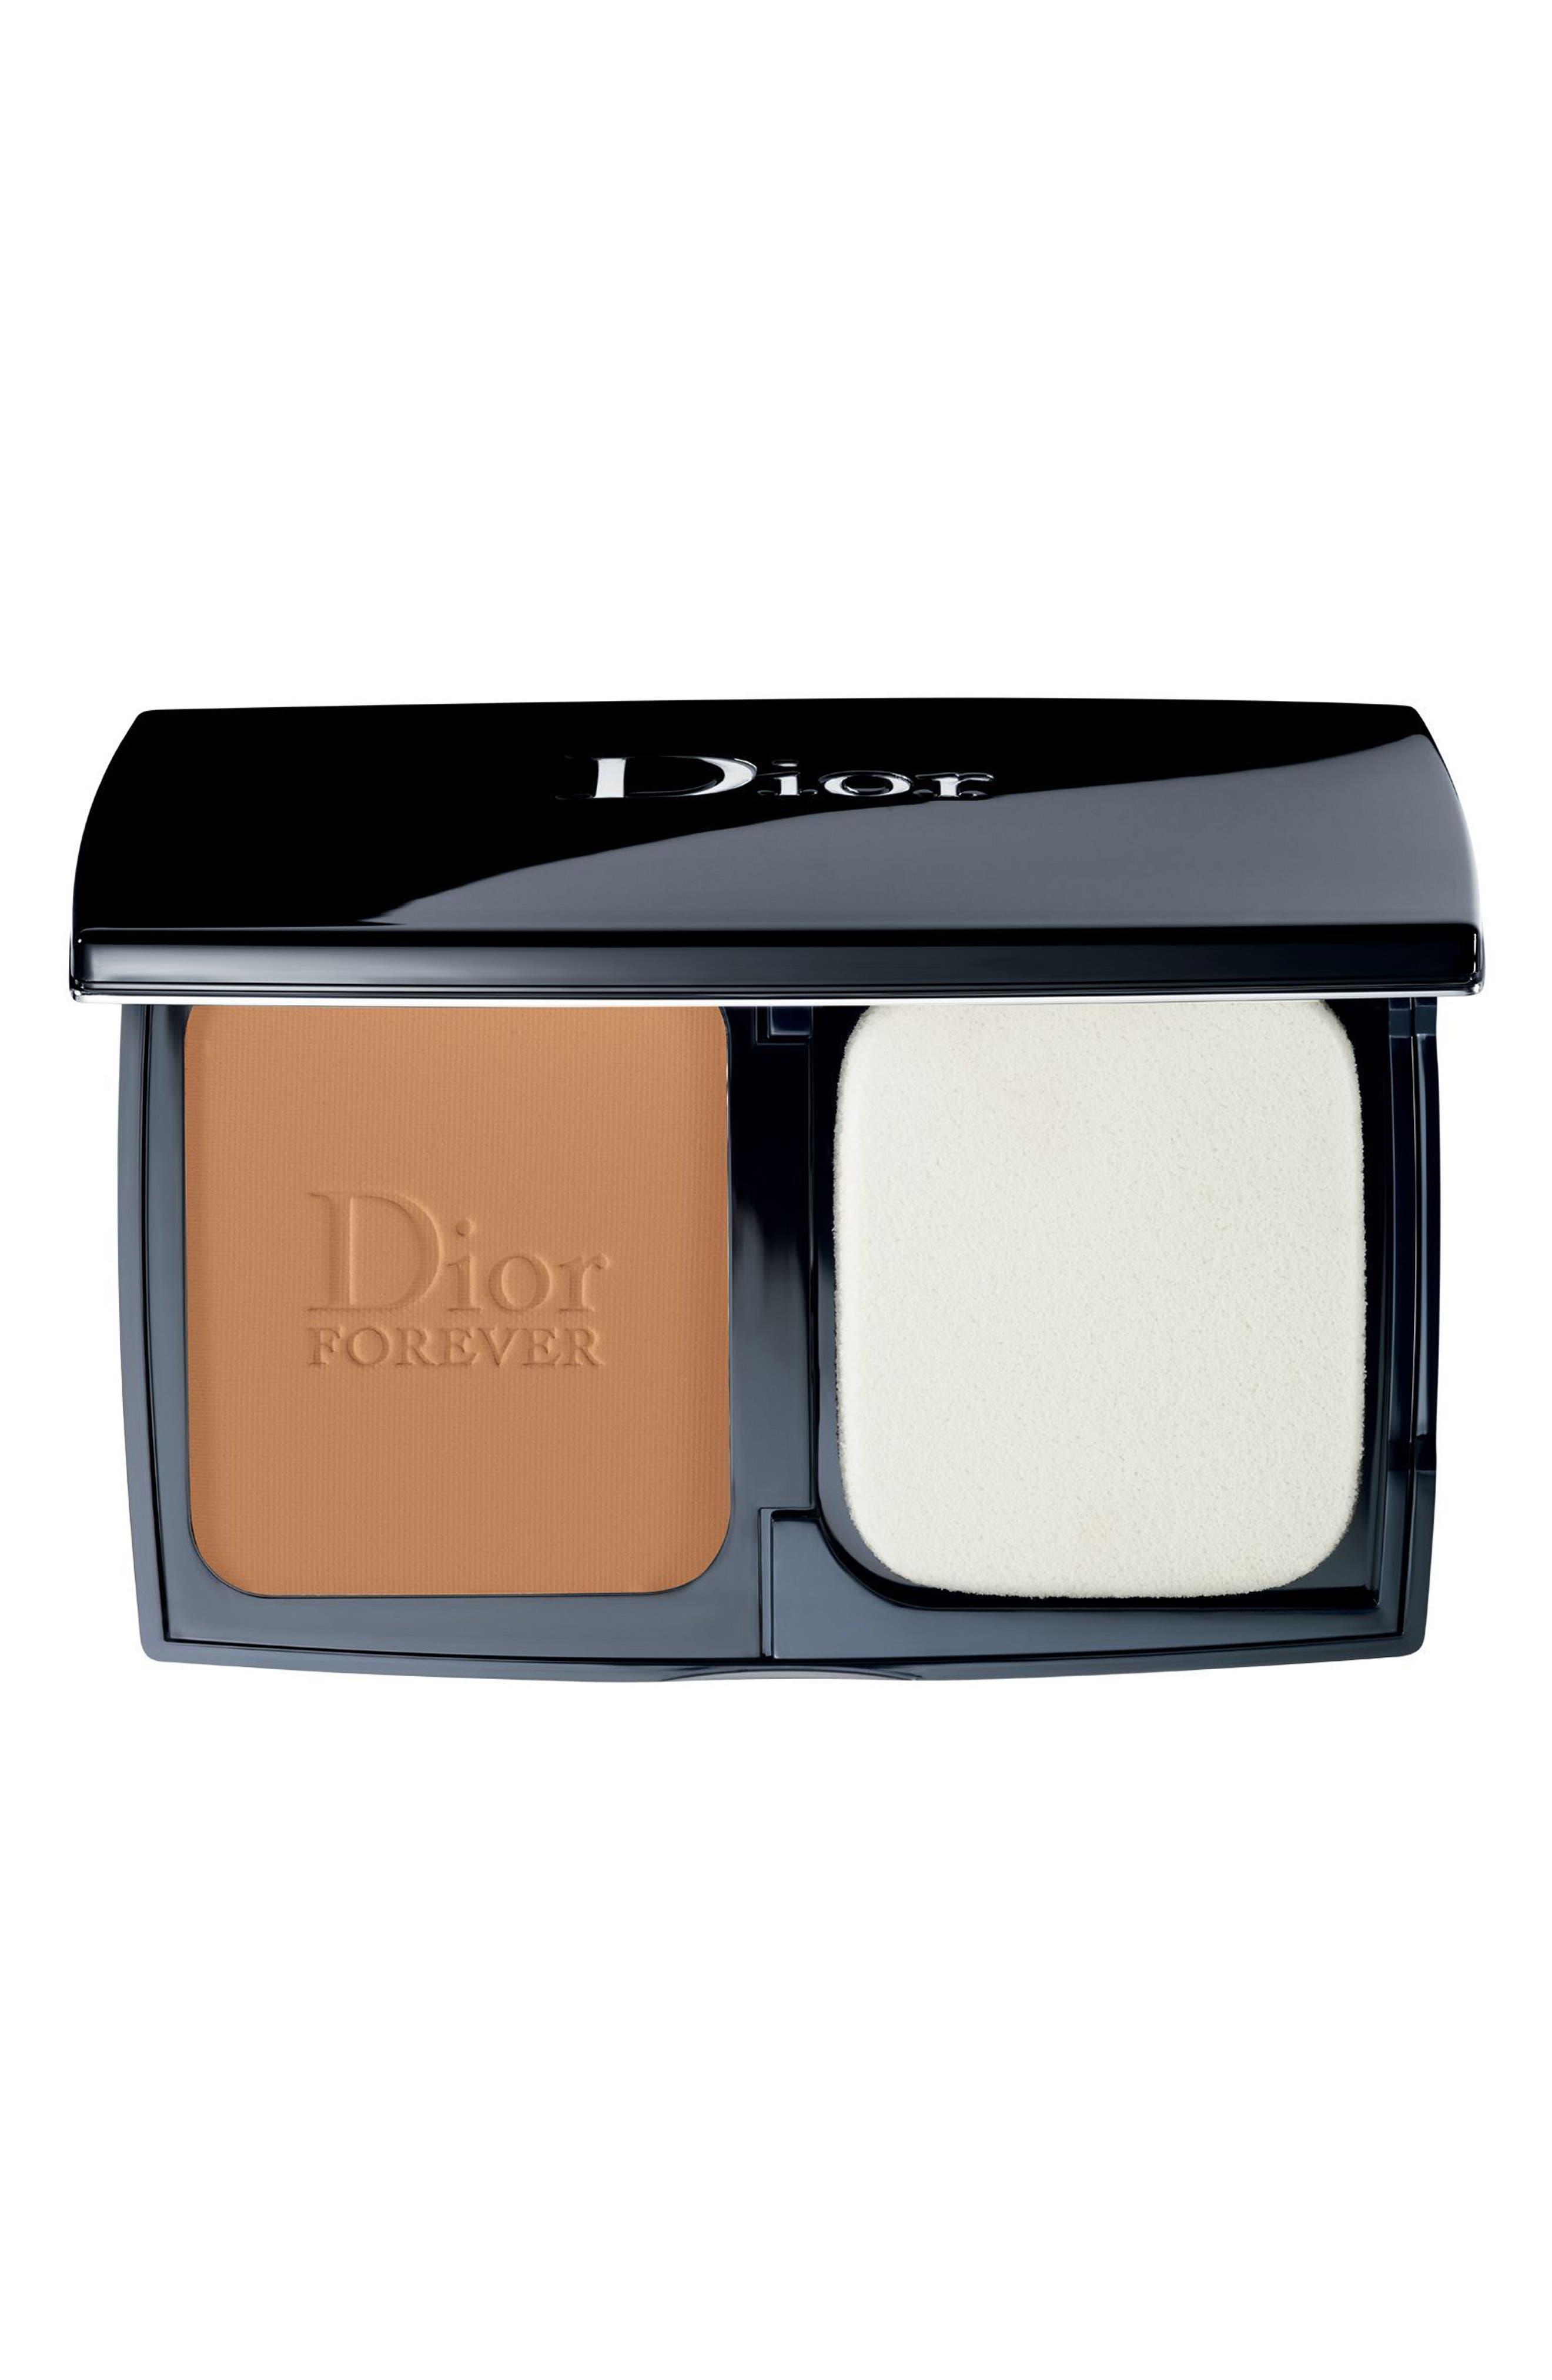 Dior Diorskin Forever Extreme Control - 060 Light Mocha